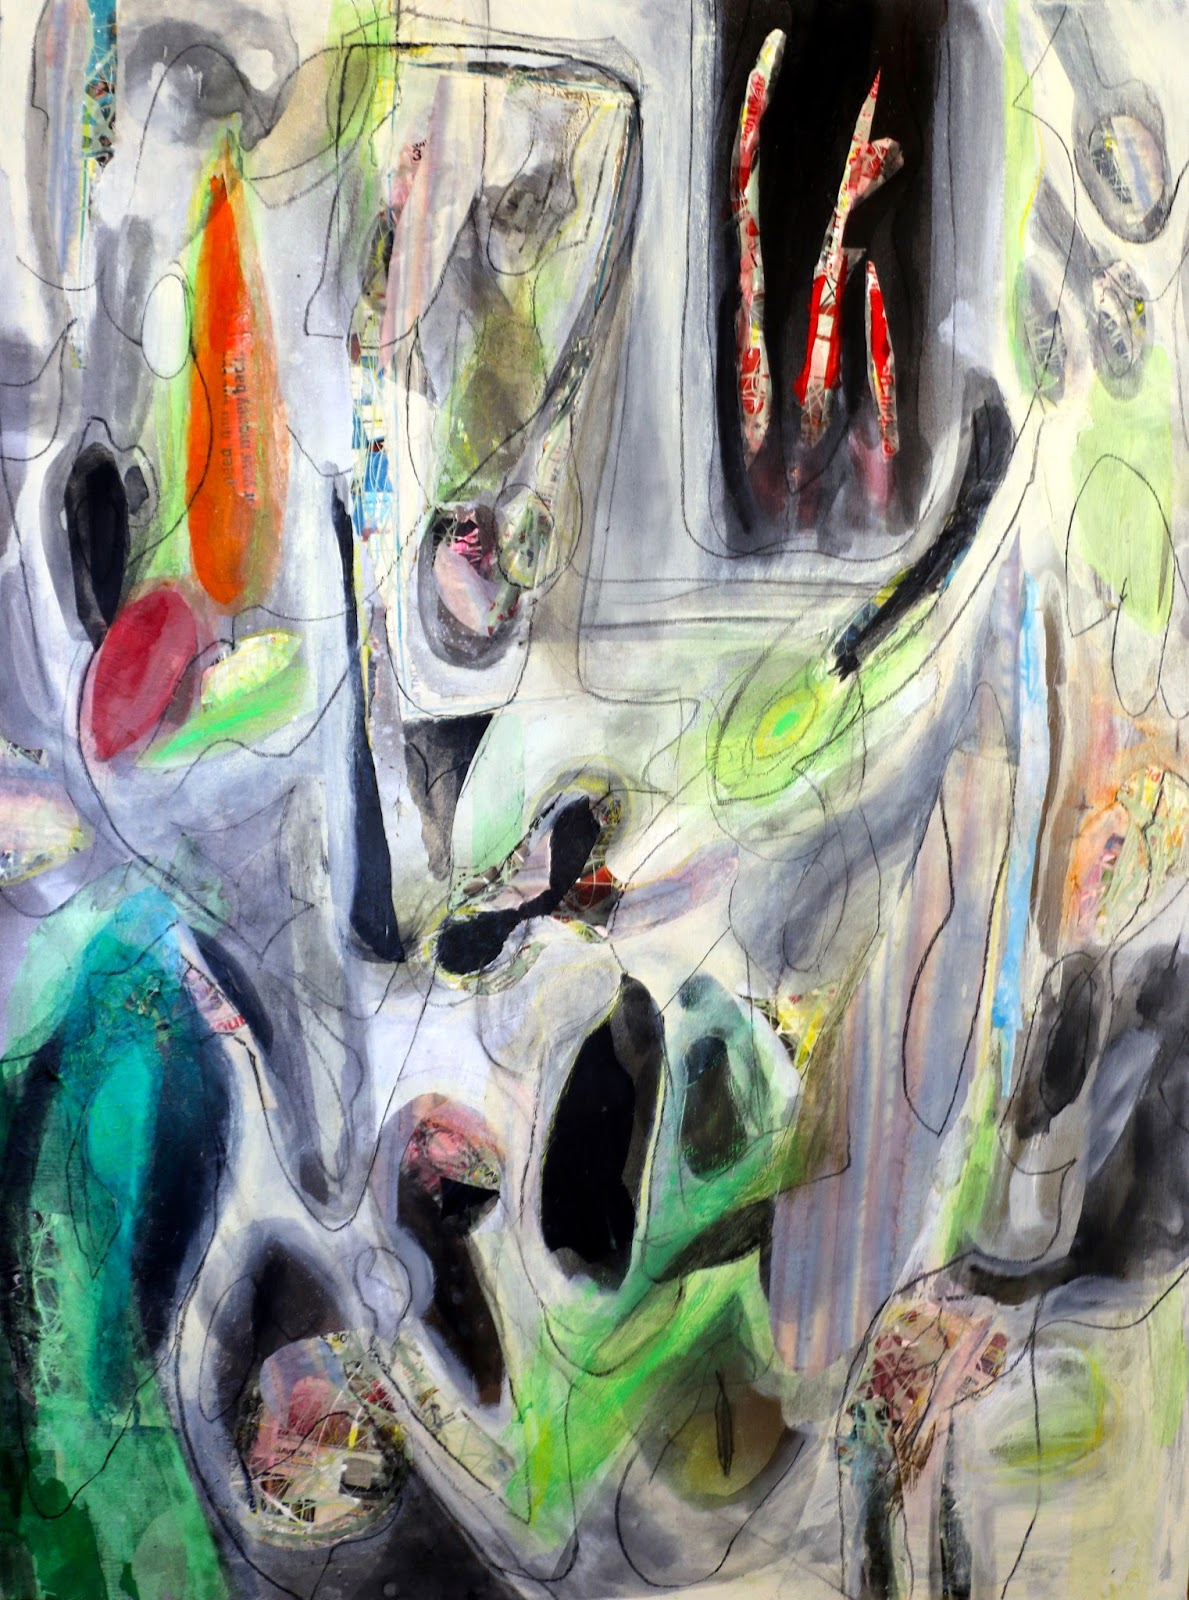 Most Inspiring   Wallpaper Horse Collage - Art%2BTime%2Bof%2Bthe%2BSeason  Perfect Image Reference_182071.JPG